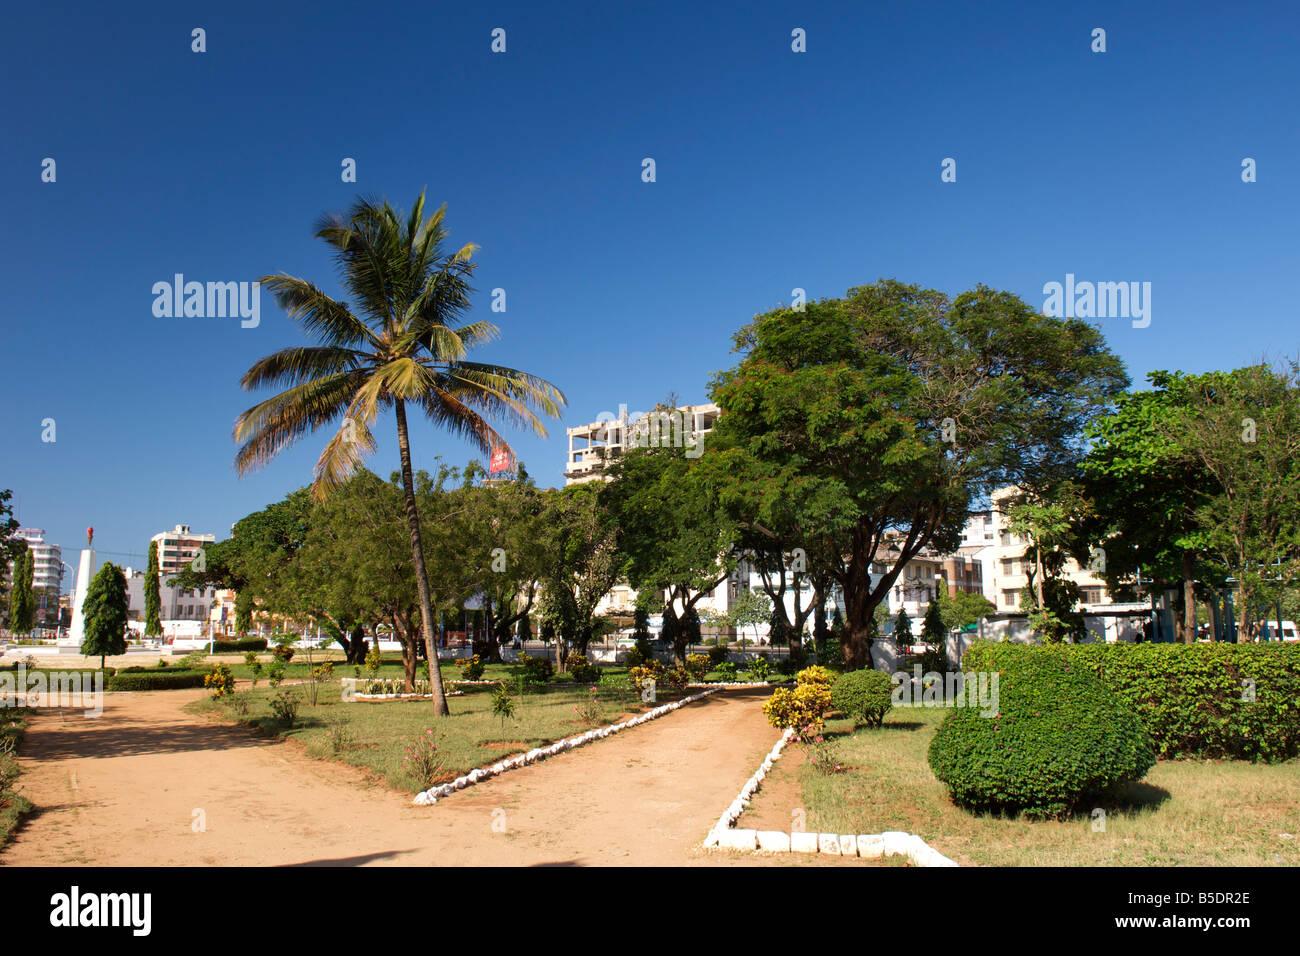 Public gardens in Dar es Salaam, the capital of Tanzania. - Stock Image